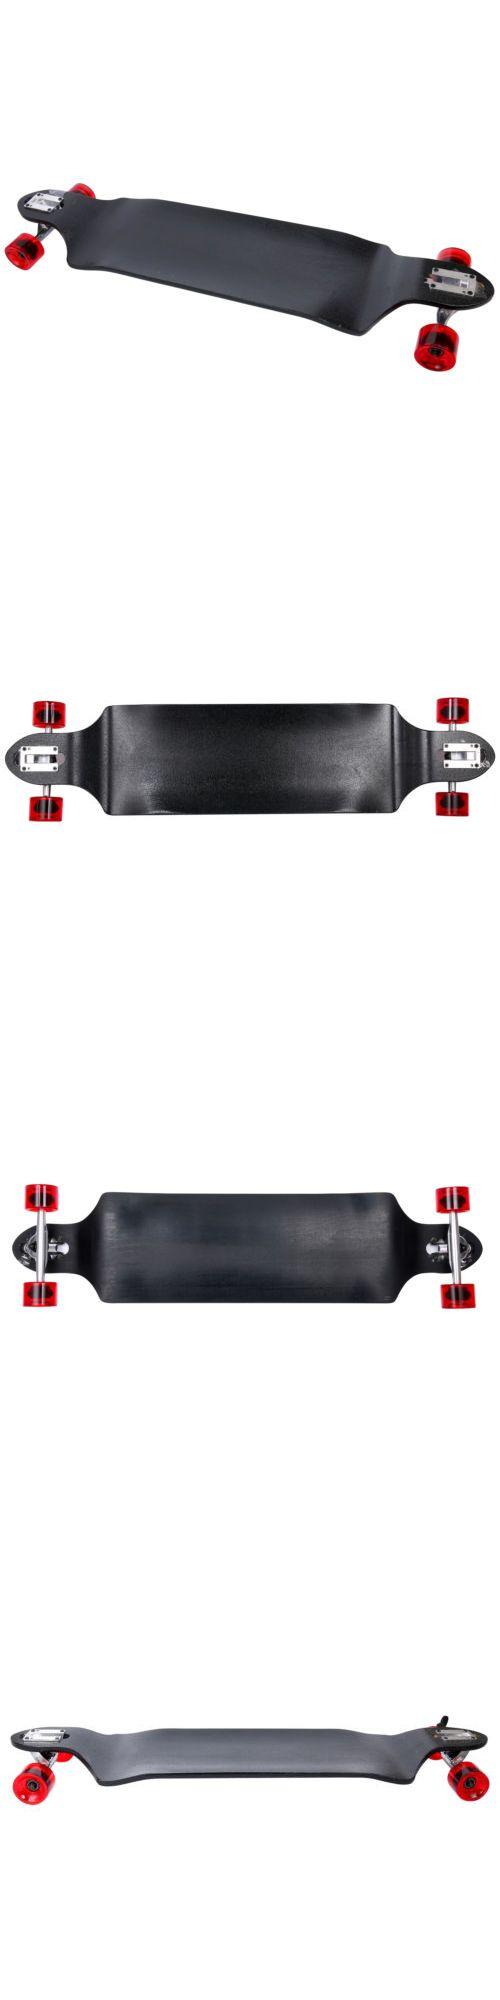 Decks 165944: Professional 41 X 9-1/2 Longboard Skateboard Cruiser Through Downhill Complete -> BUY IT NOW ONLY: $59.89 on eBay!